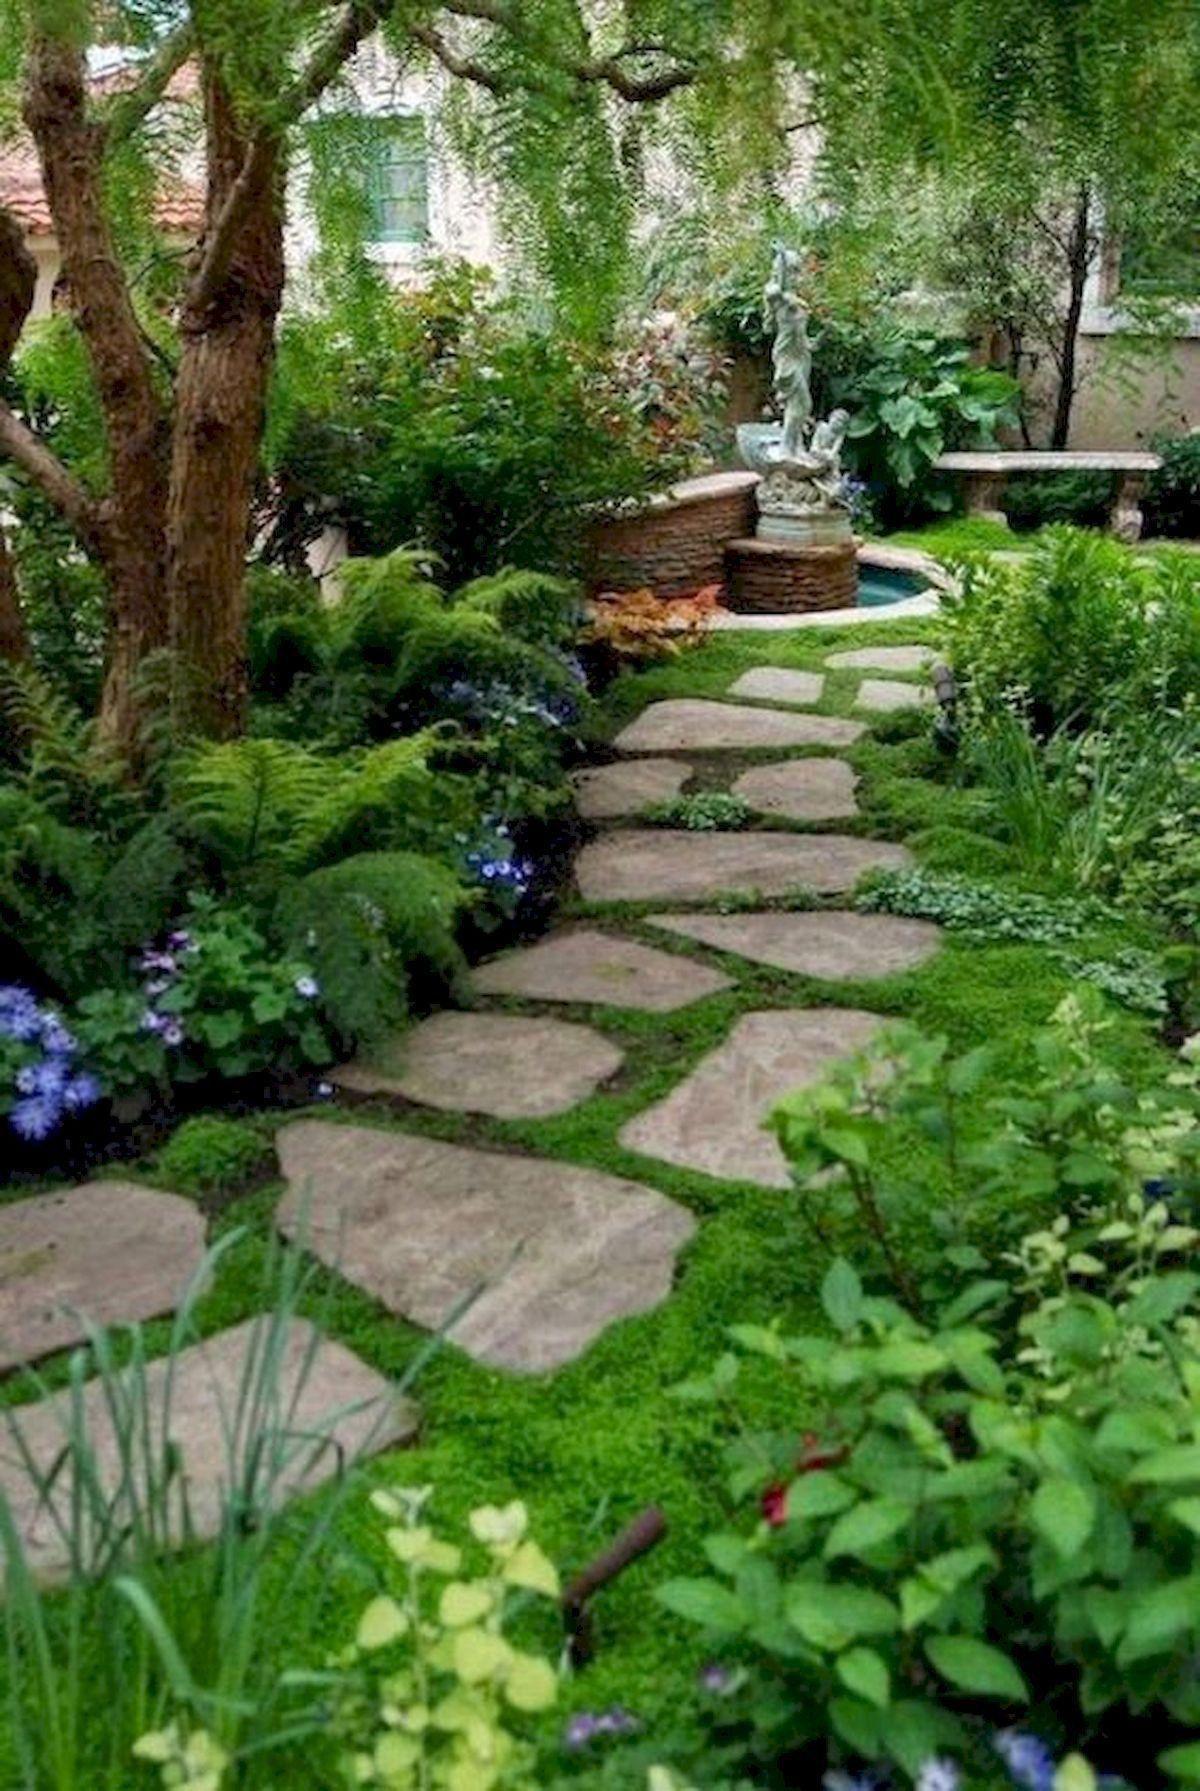 80 Best Garden Design Ideas For Making Your Page Beautiful Bestgardendesi Pathway Landscaping Small Garden Design Ideas Low Maintenance Backyard Garden Design